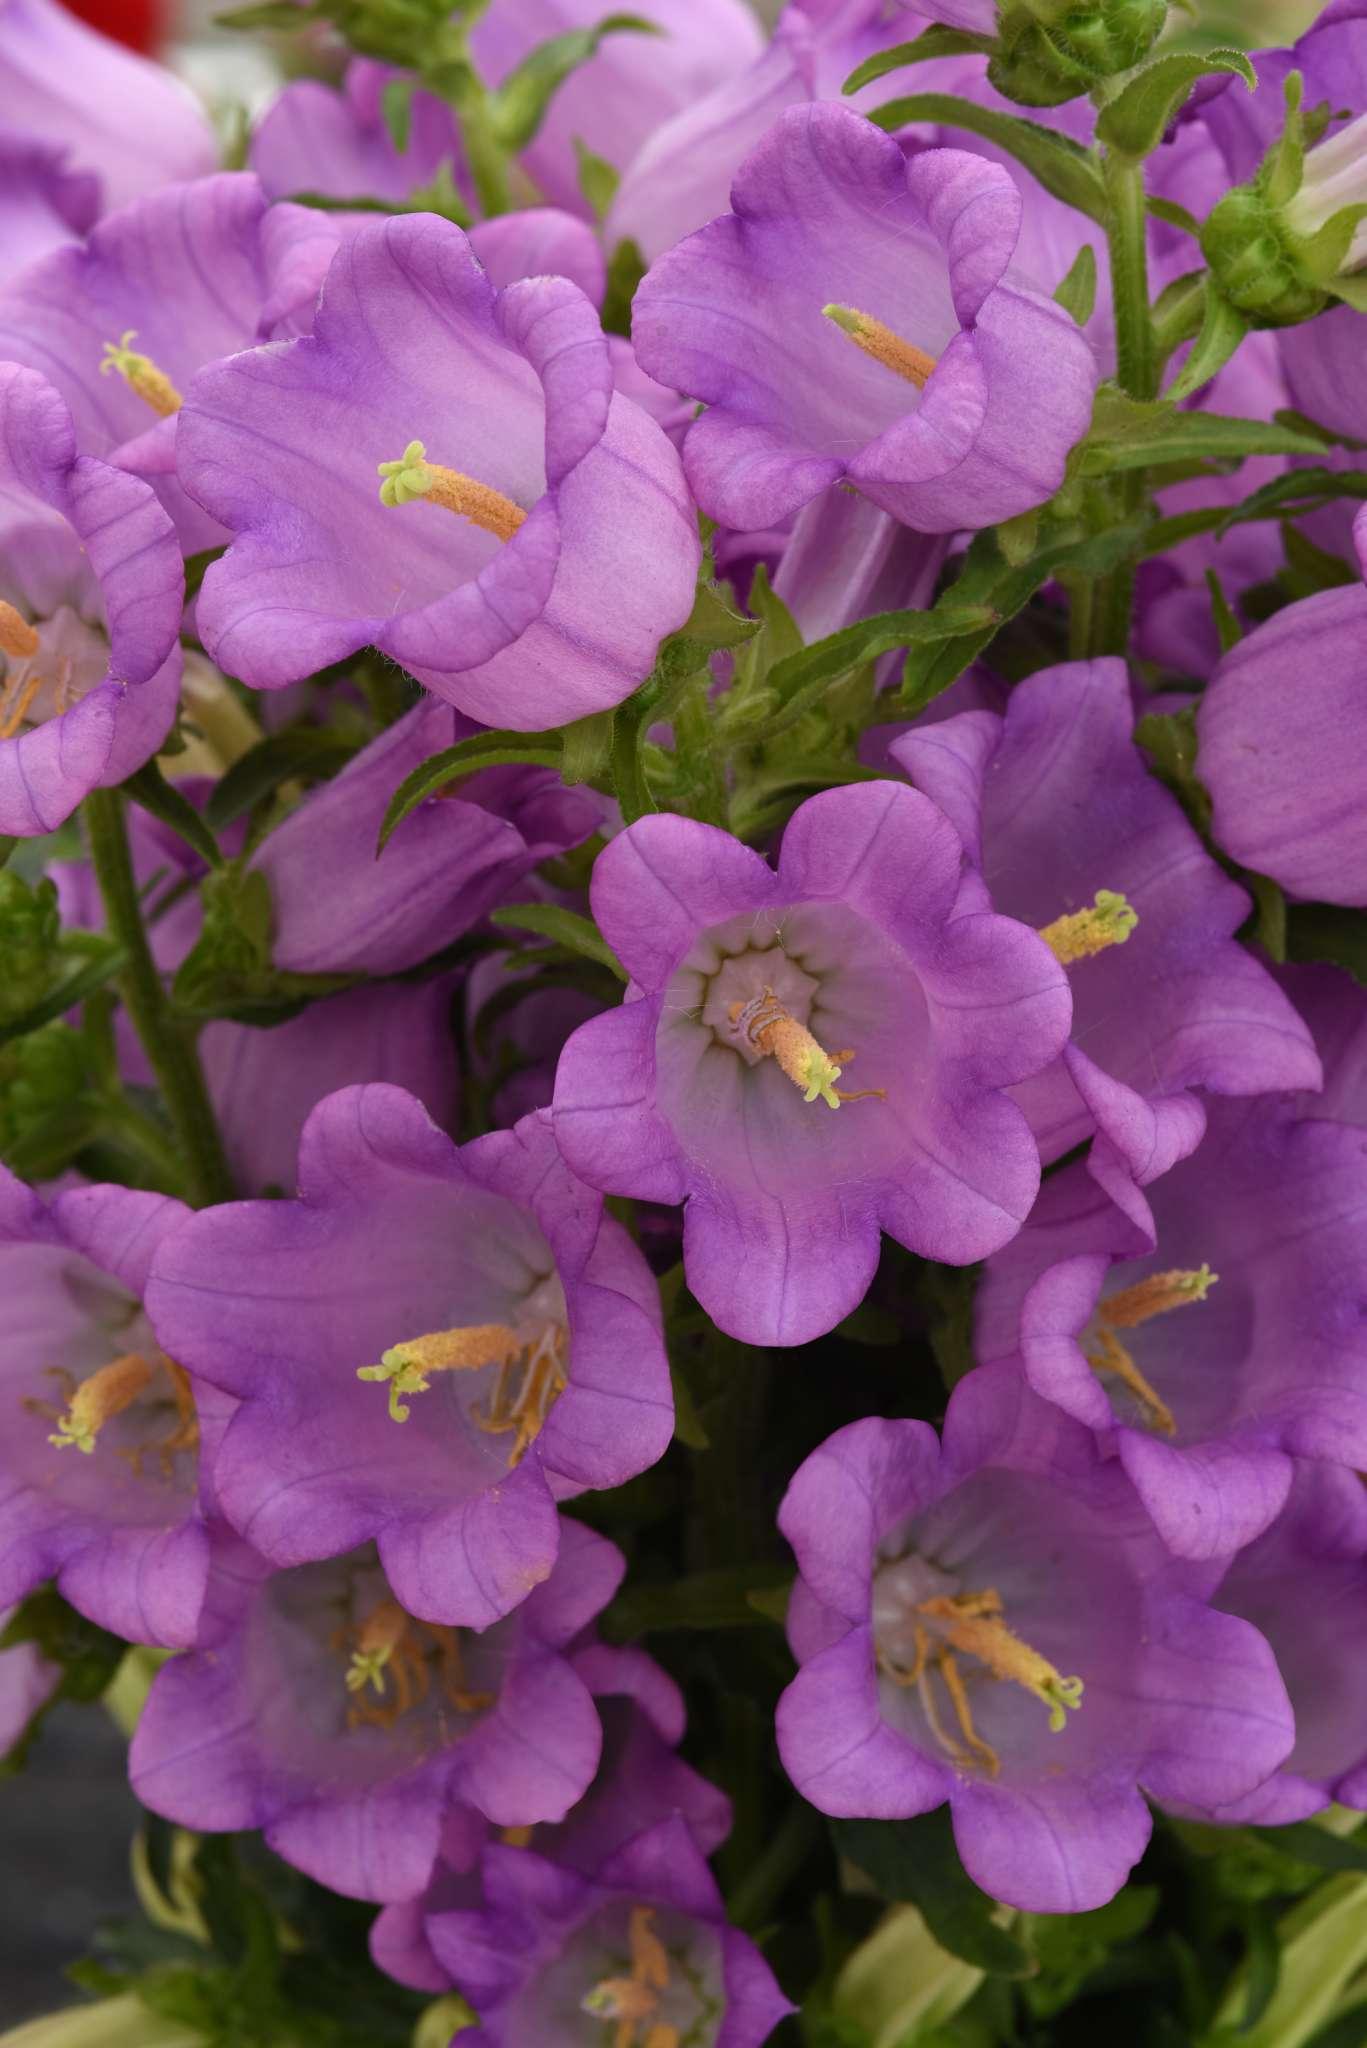 Campanula Campana Lilac (Non-Organic)